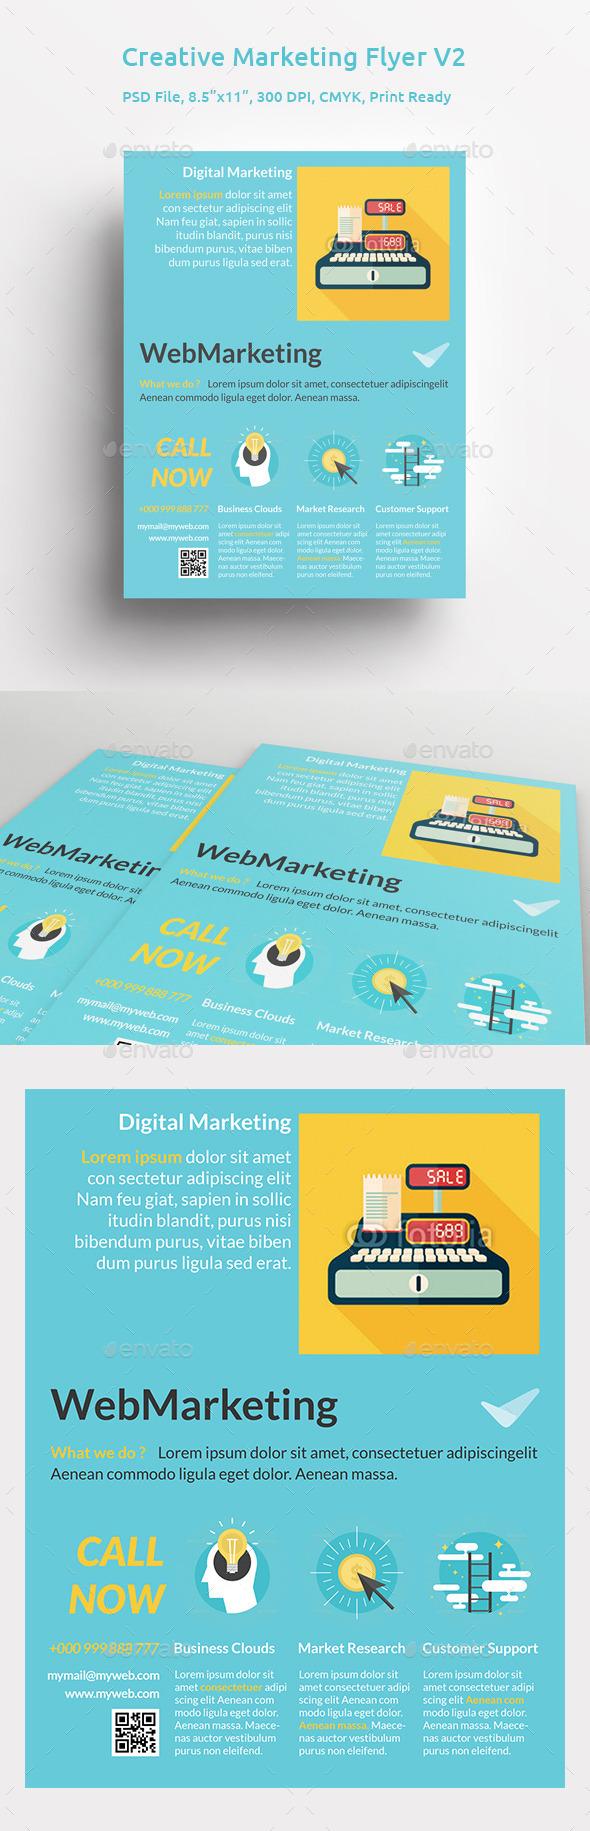 GraphicRiver Creative Marketing Flyer V2 11287484